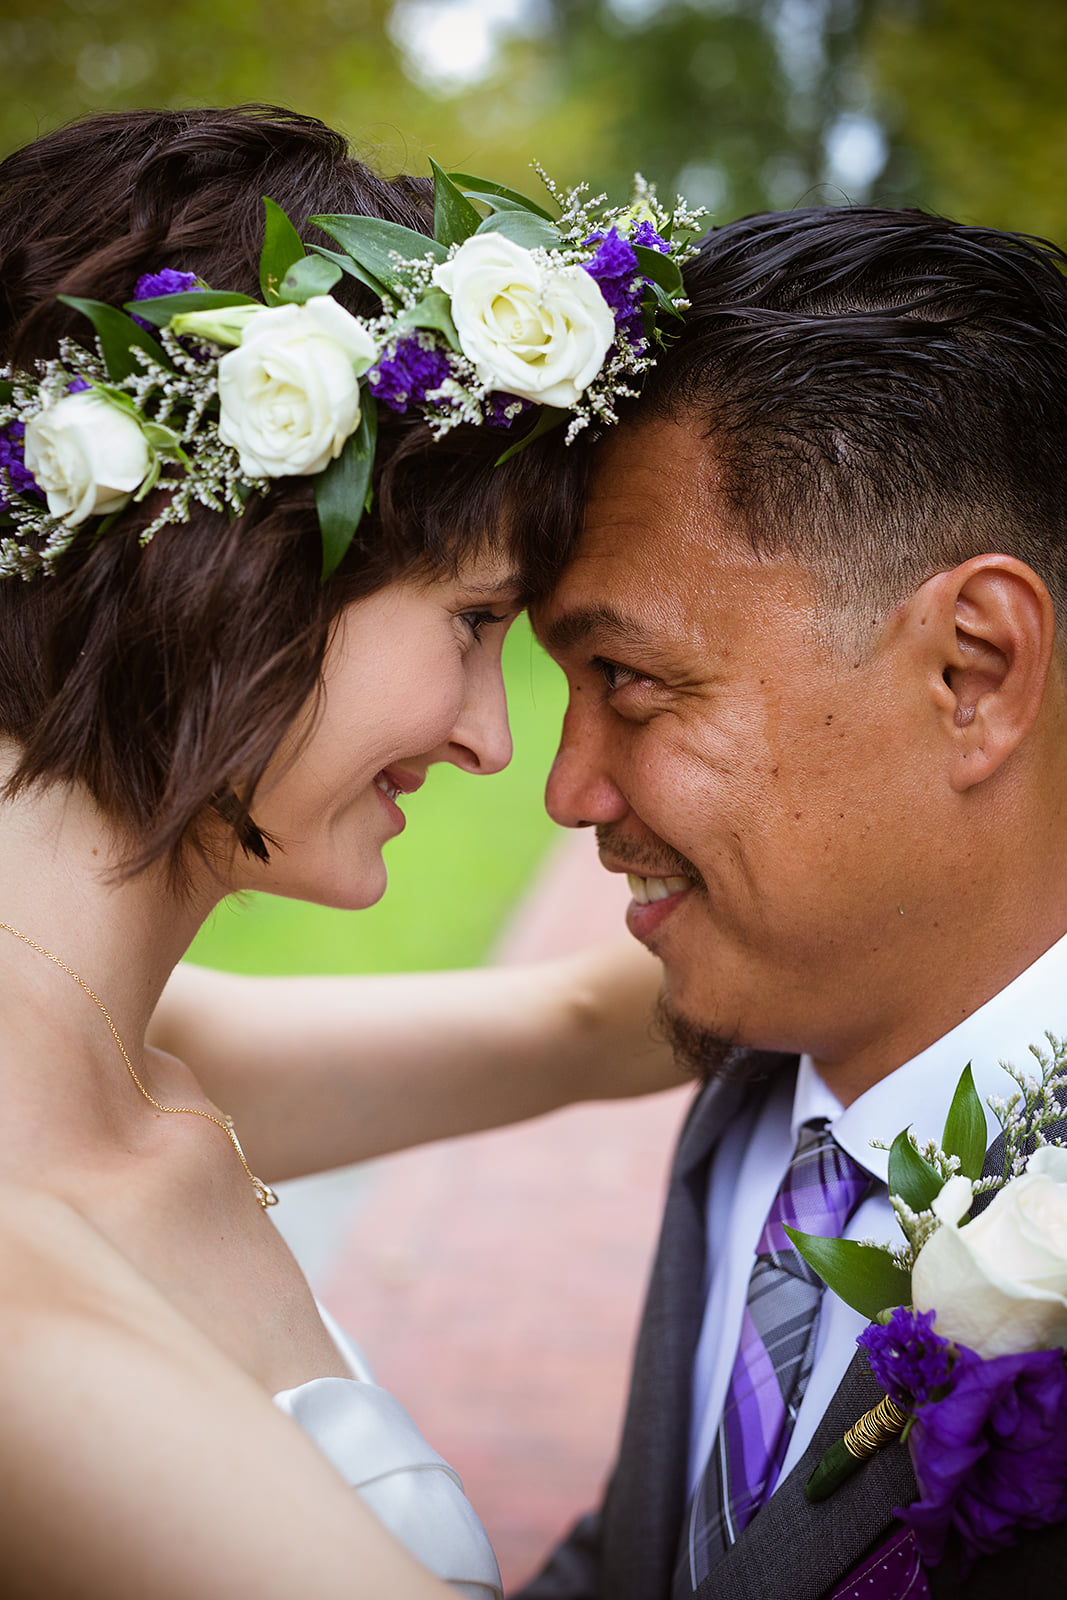 Blacano Wedding - Formals-67.jpg